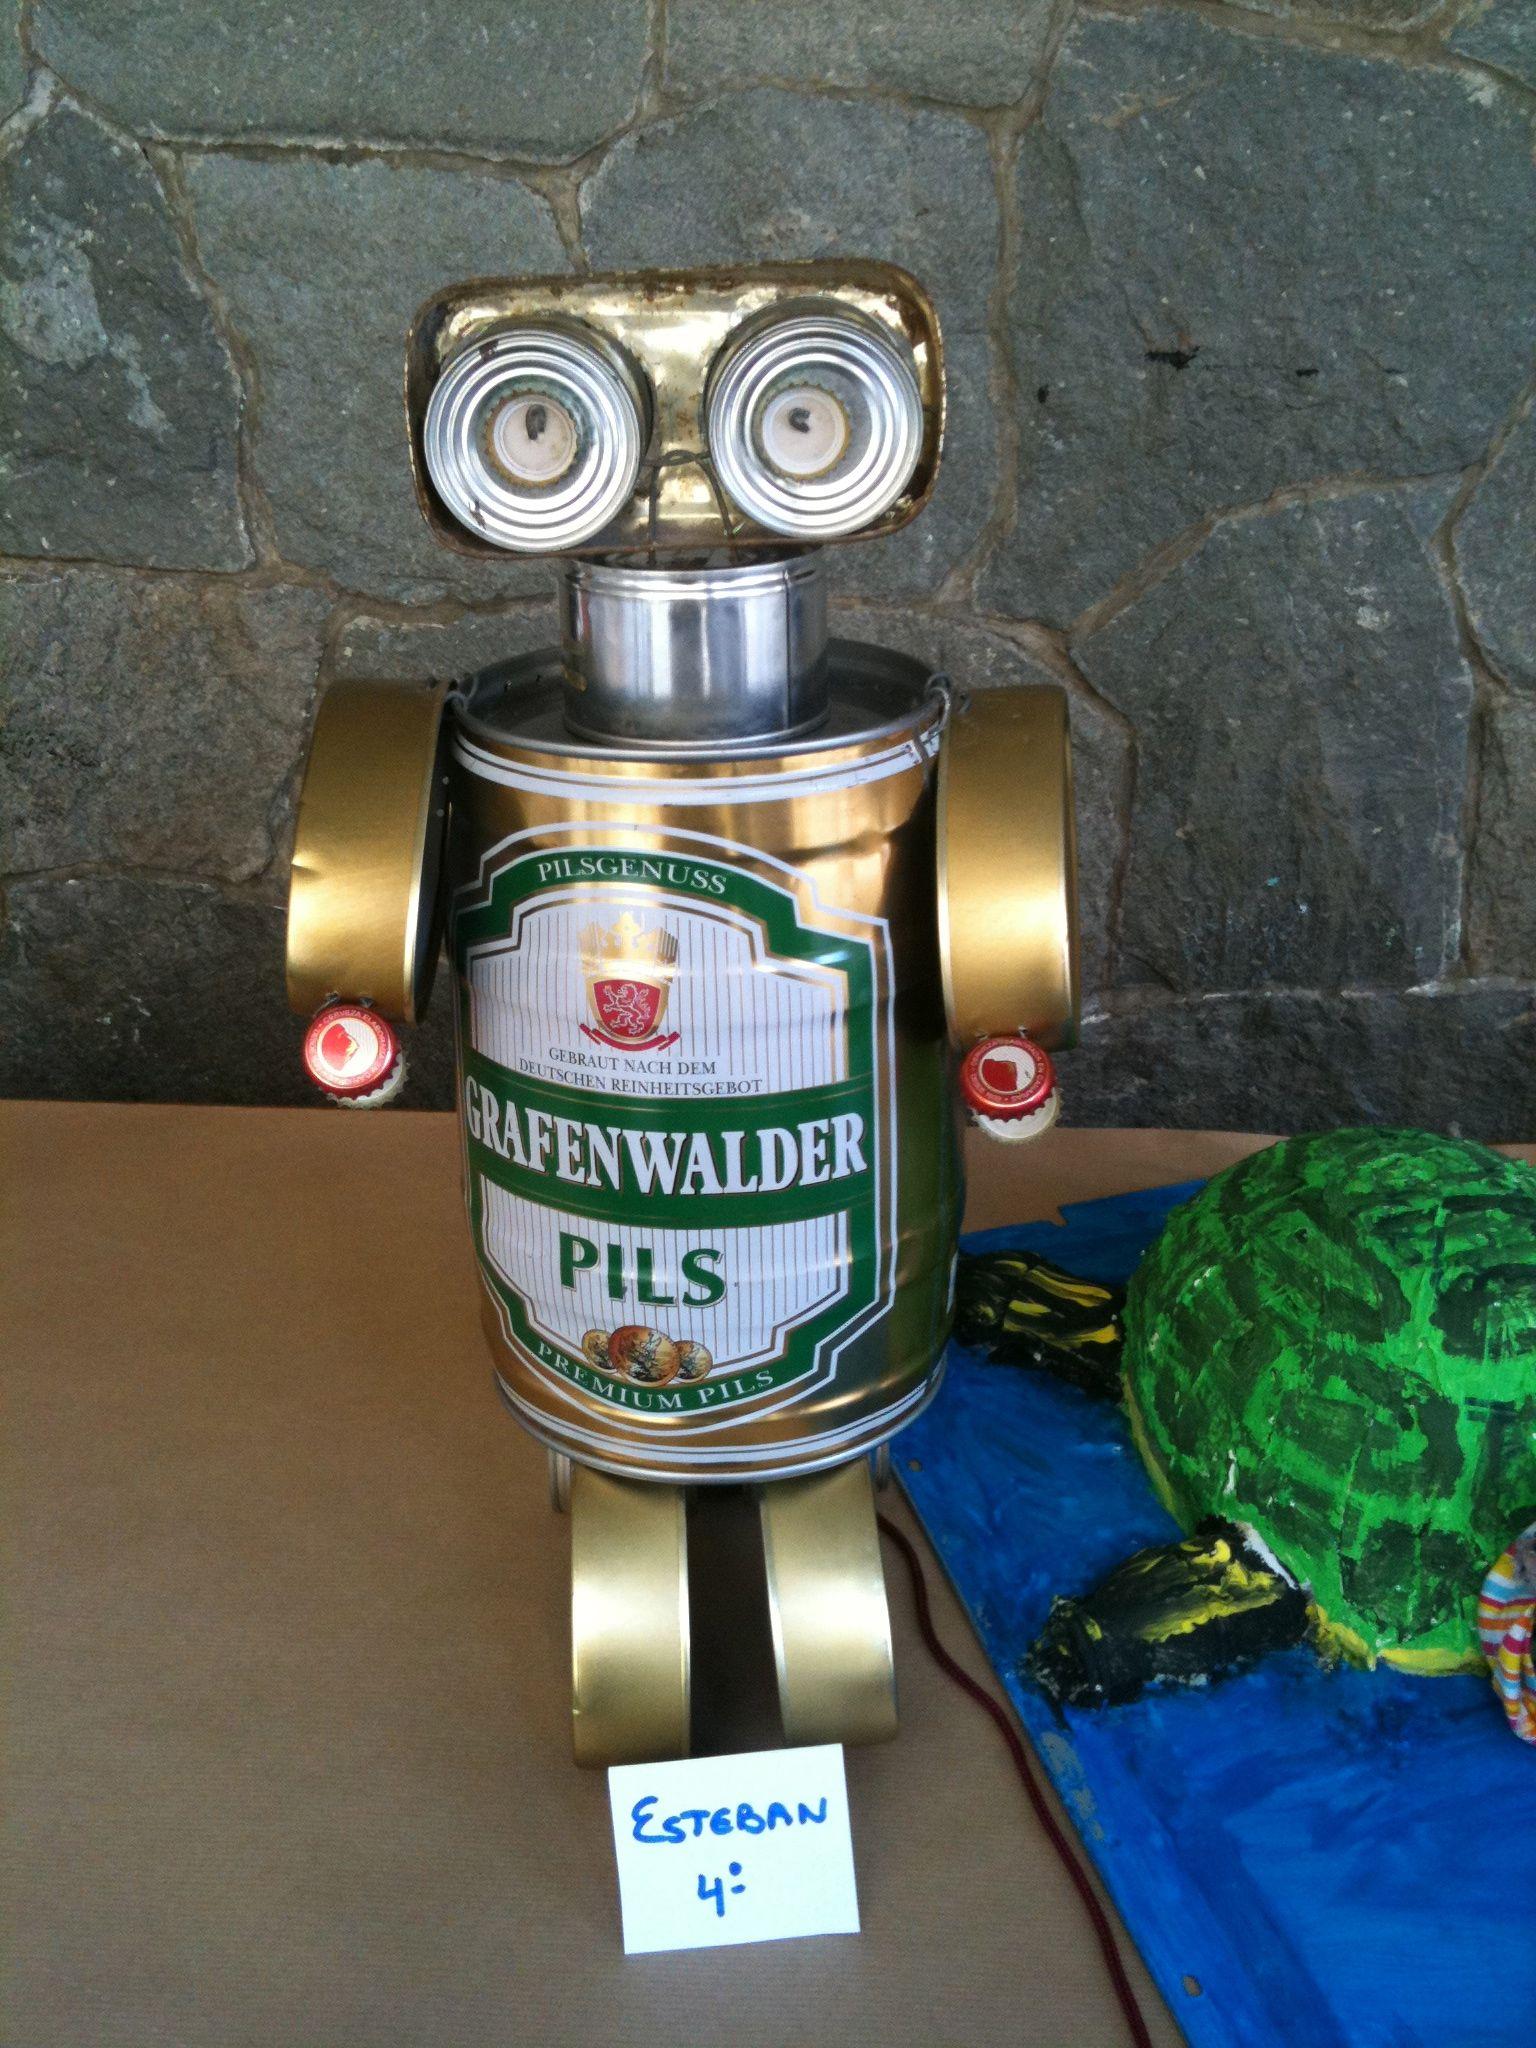 Wall E Robot Craft With Cans And Tins Wall E Robt Avec De Canetes Et Boites De Conserve